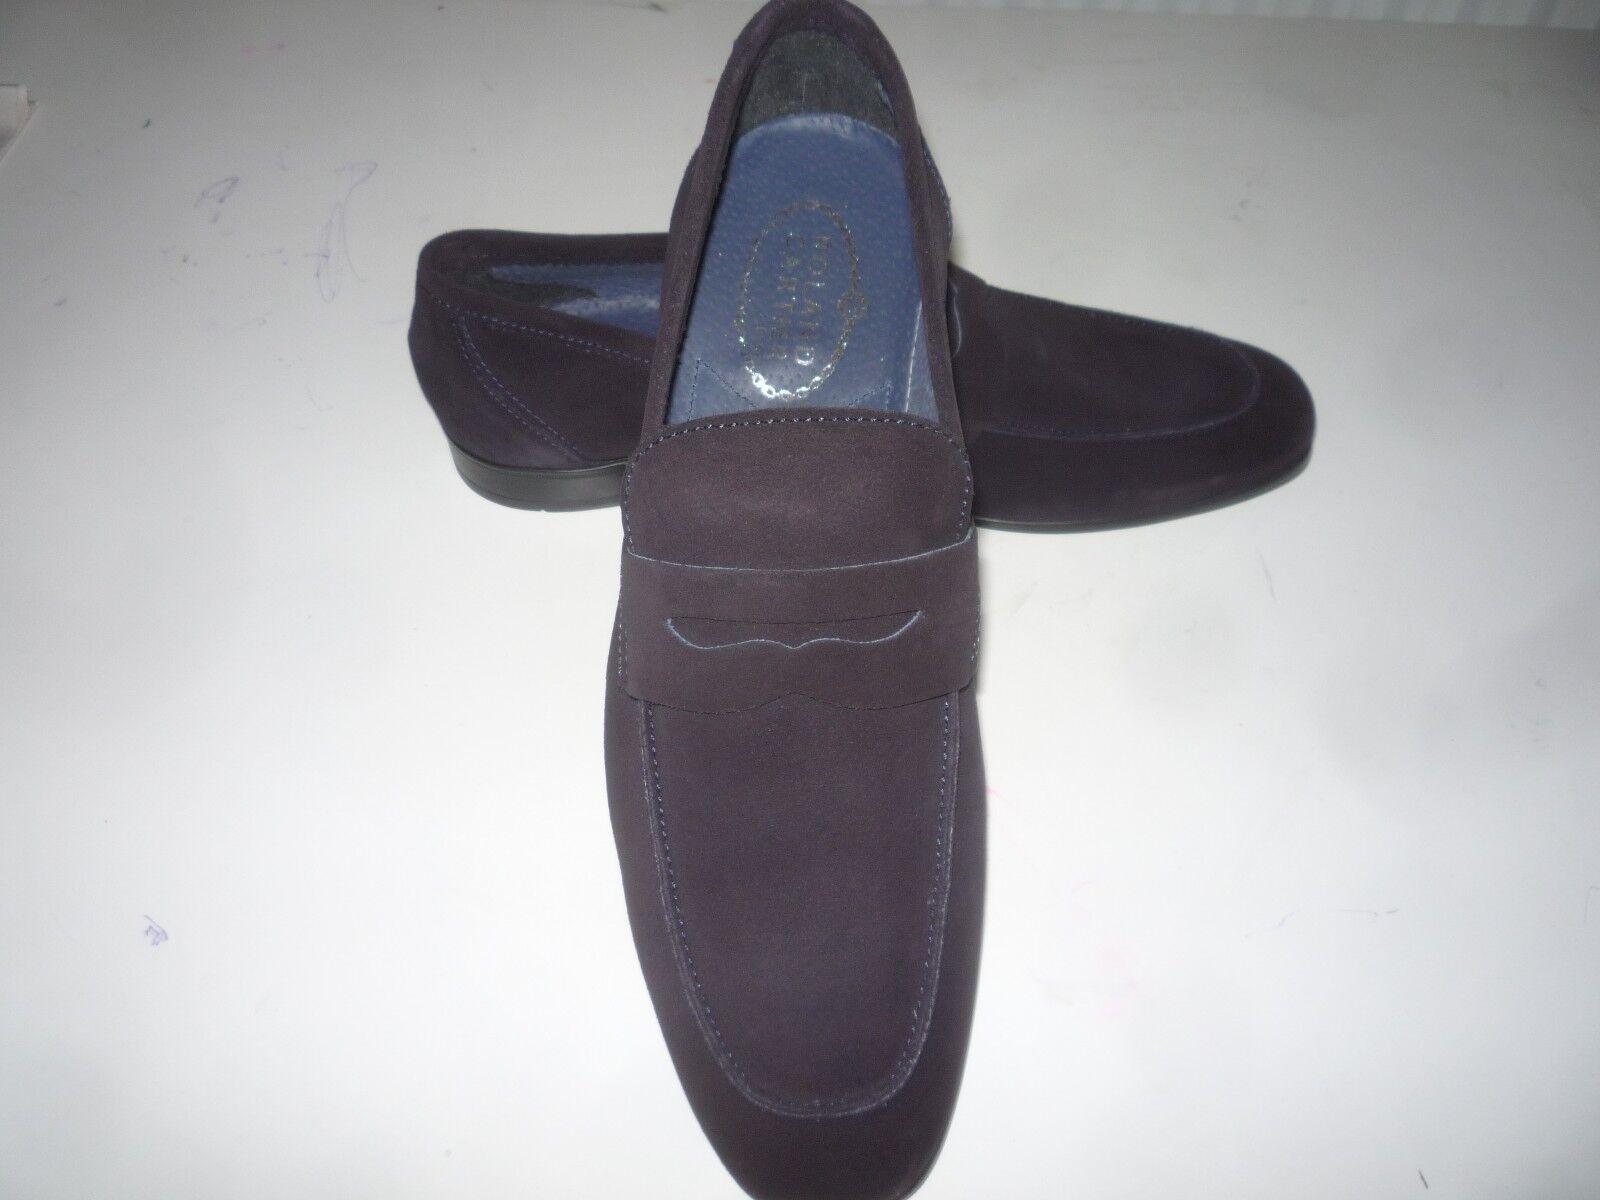 ROLAND CARTIER  Herren NAVY SUEDE LEATHER LOAFER Schuhe 8/UK / 42 EUR BRAND NEW